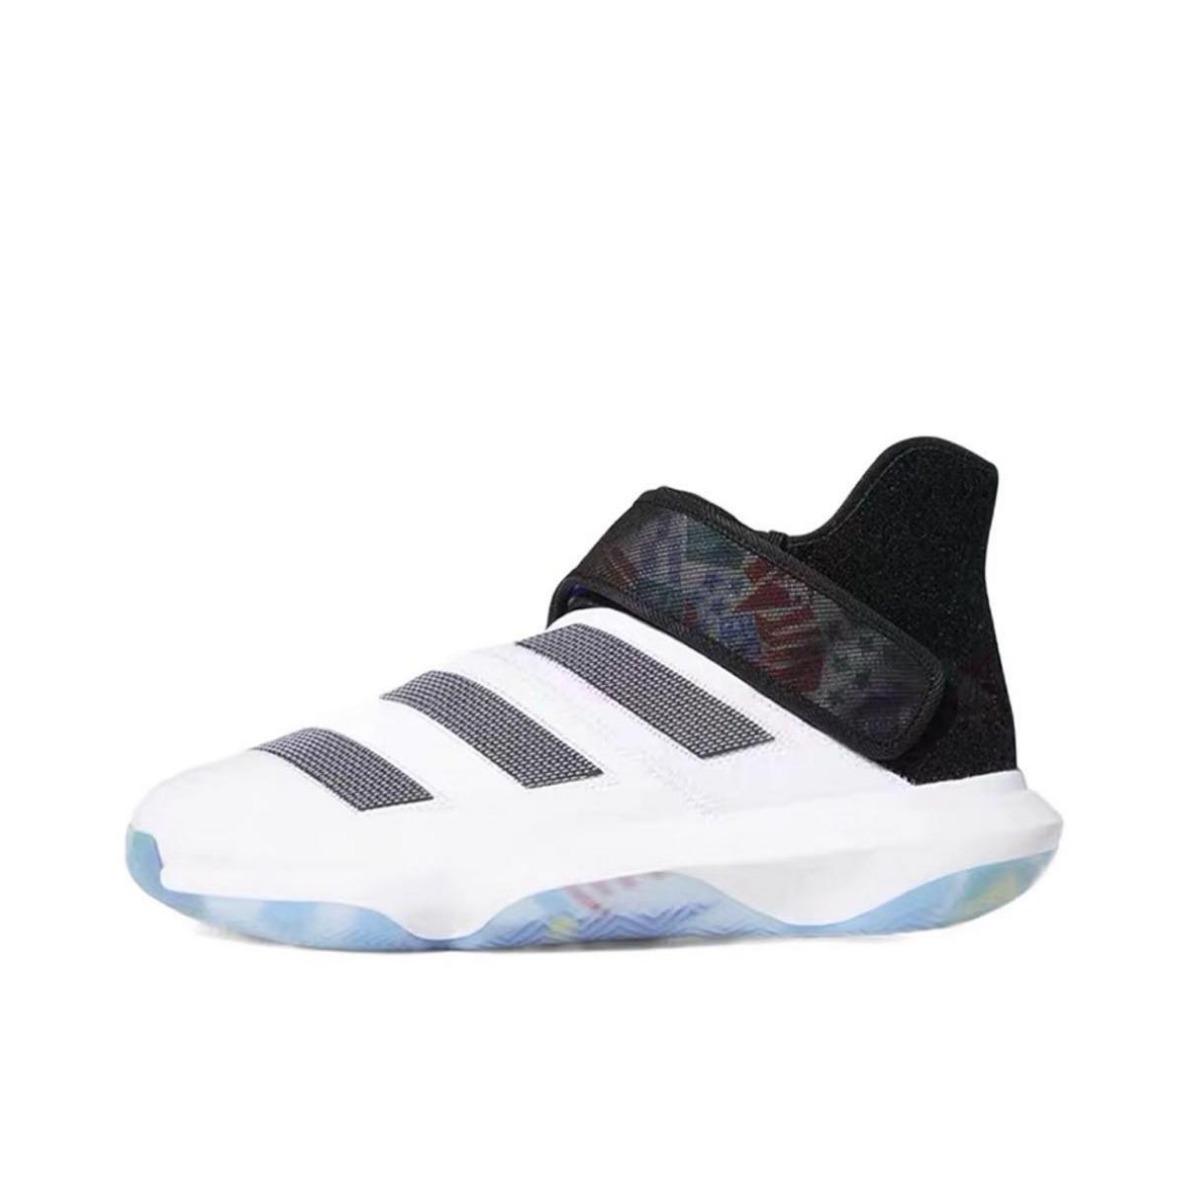 adidas Harden B/E 3 Black/White 白黑 实付到手449元